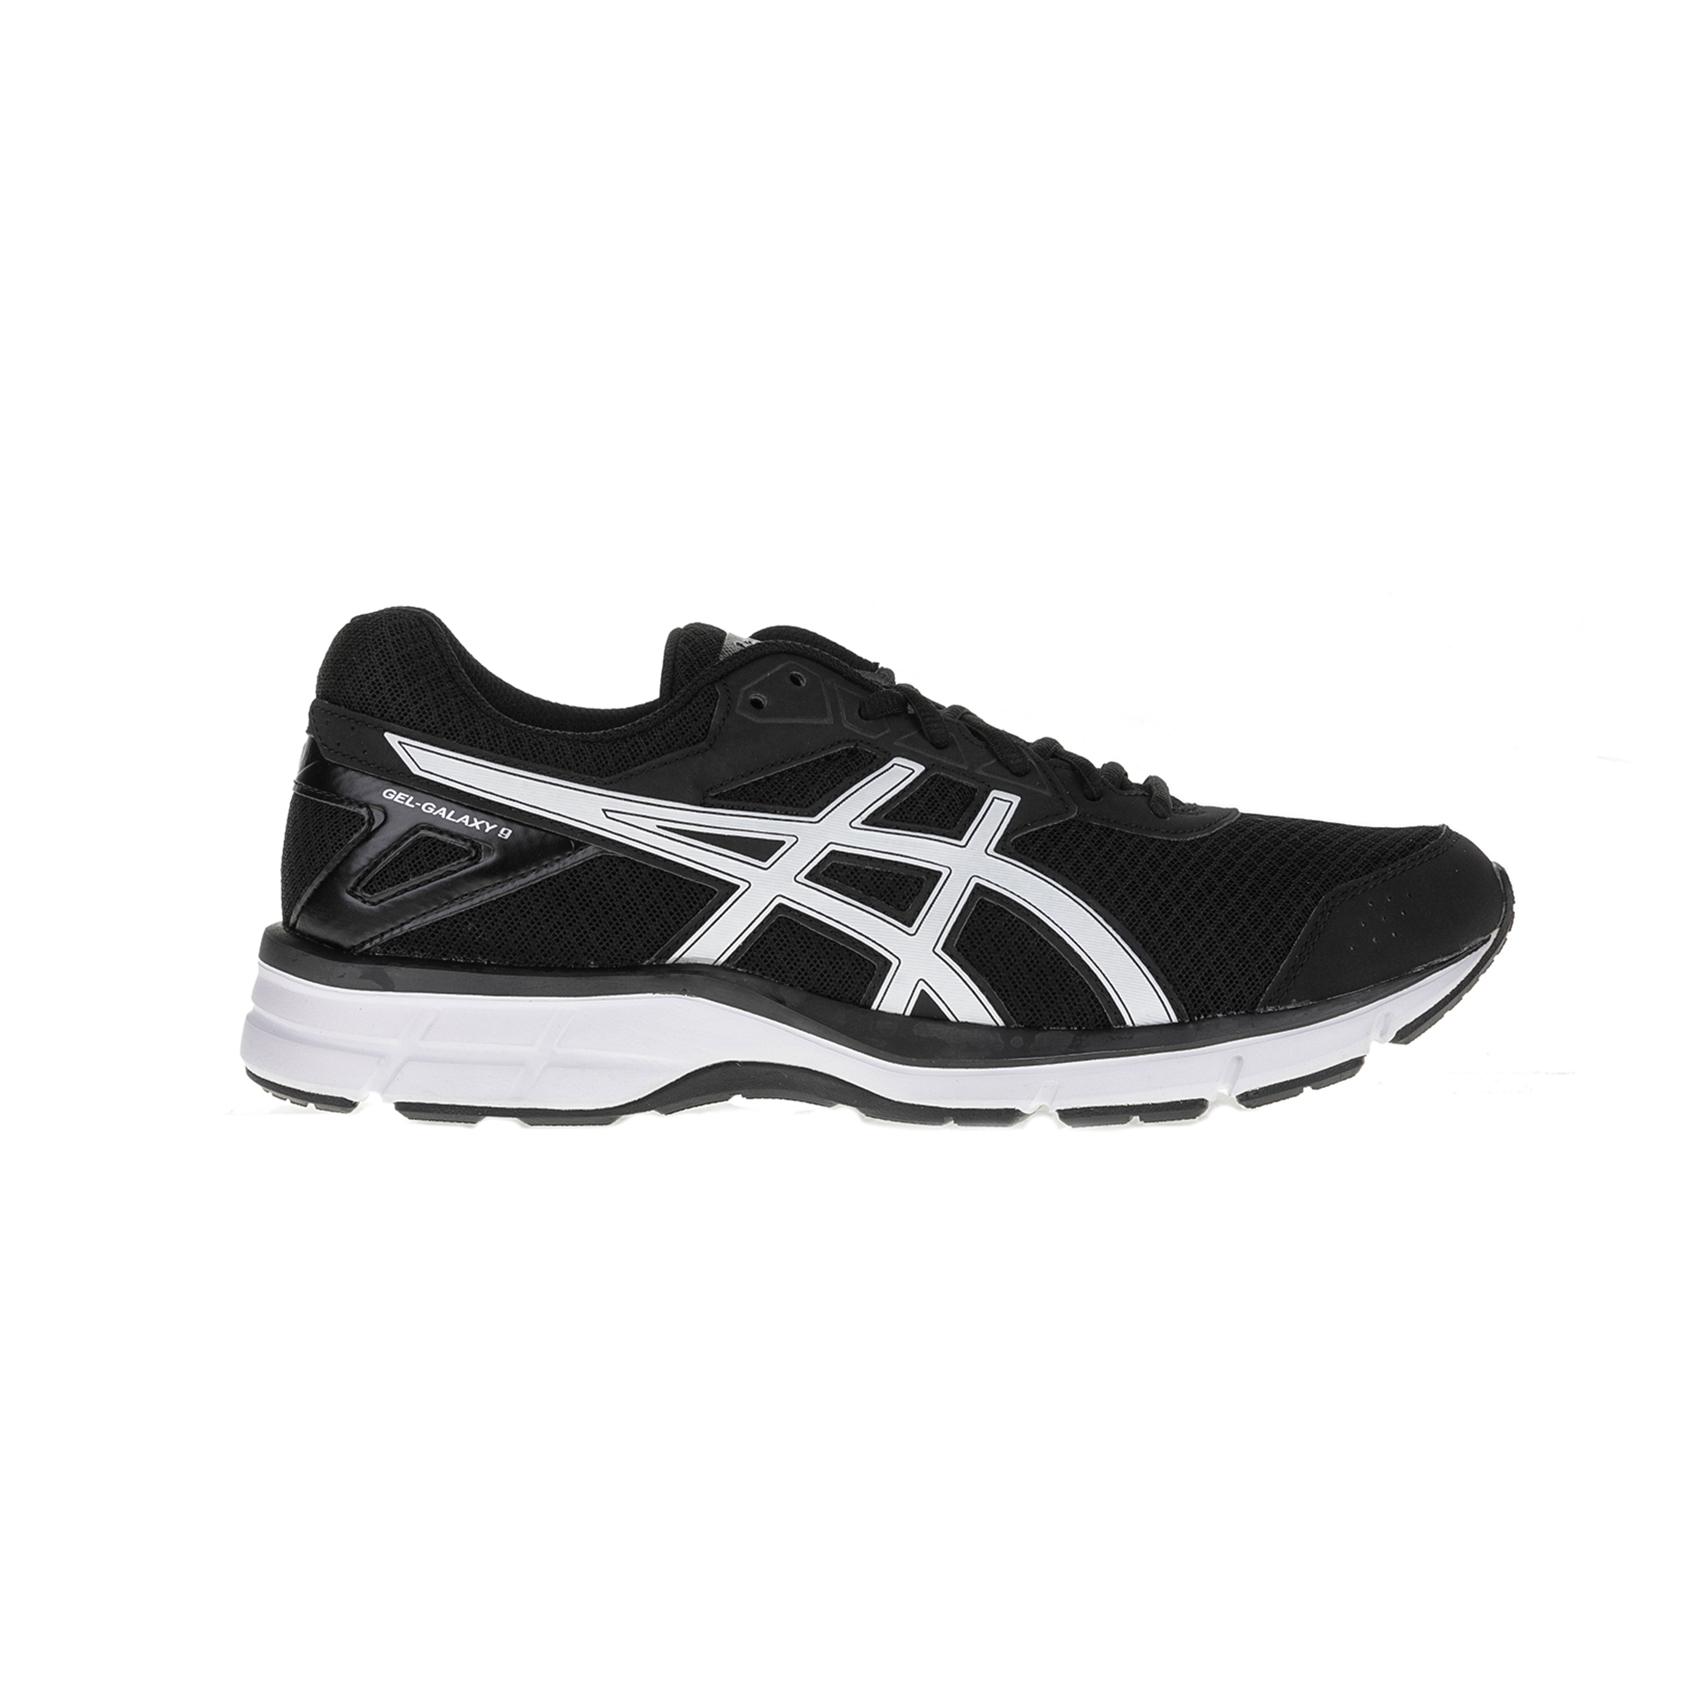 ASICS – Ανδρικά αθλητικά παπούτσια ASICS GEL-GALAXY 9 μαύρα